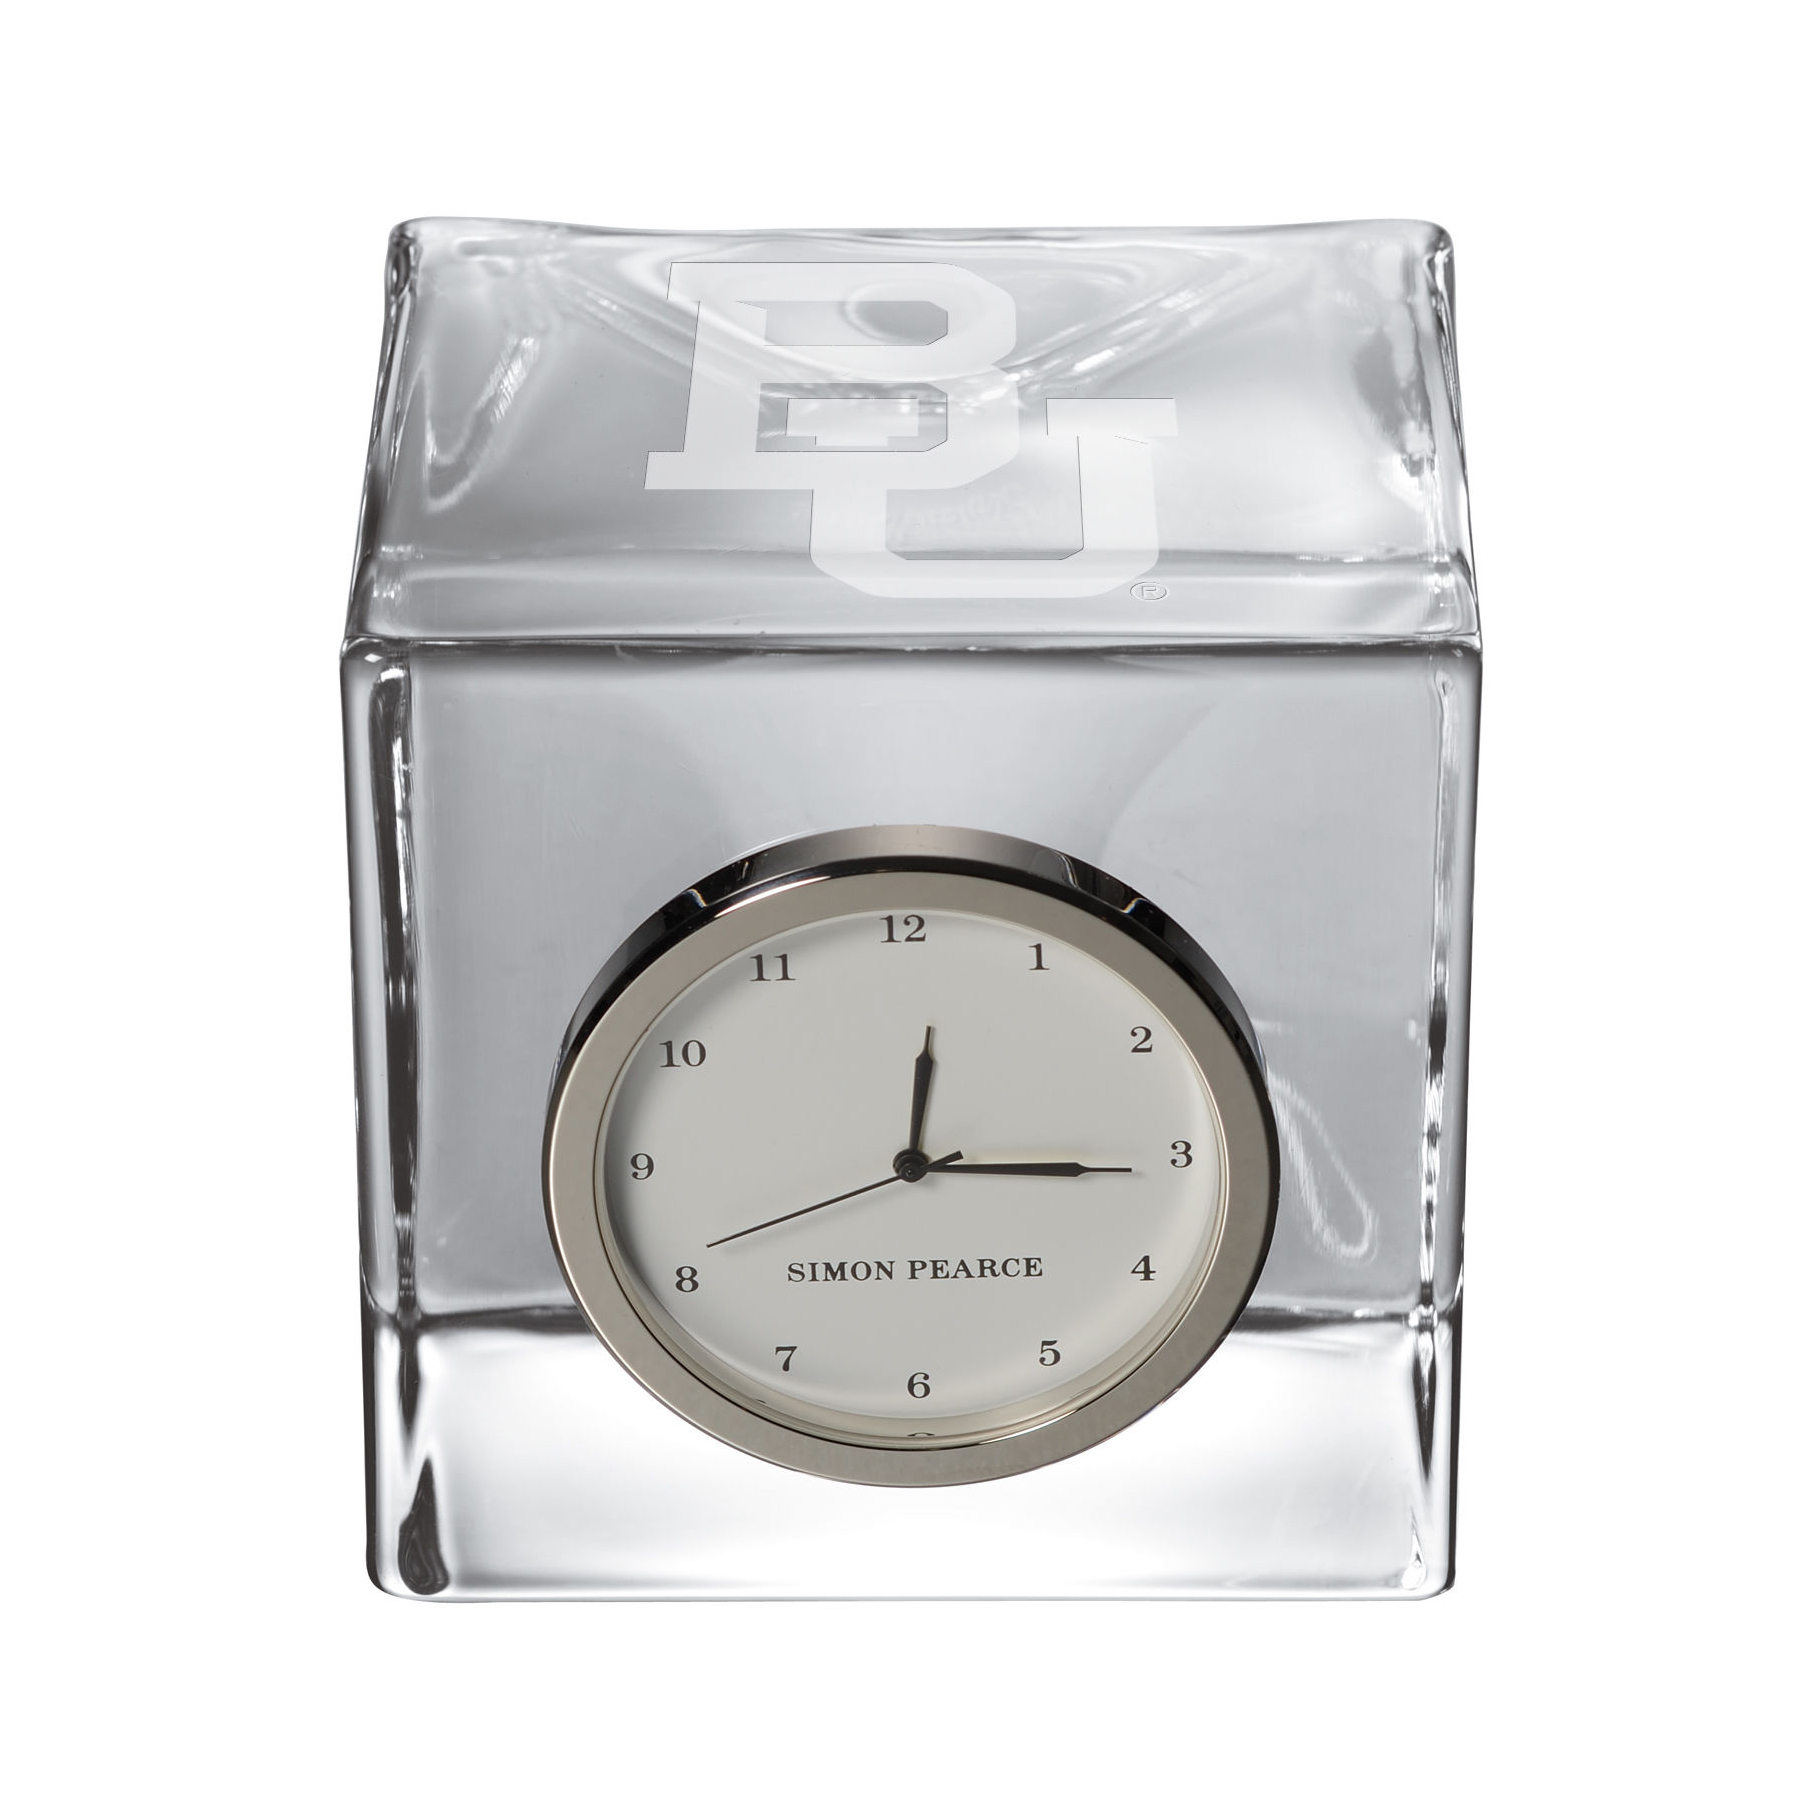 Baylor Glass Desk Clock by Simon Pearce